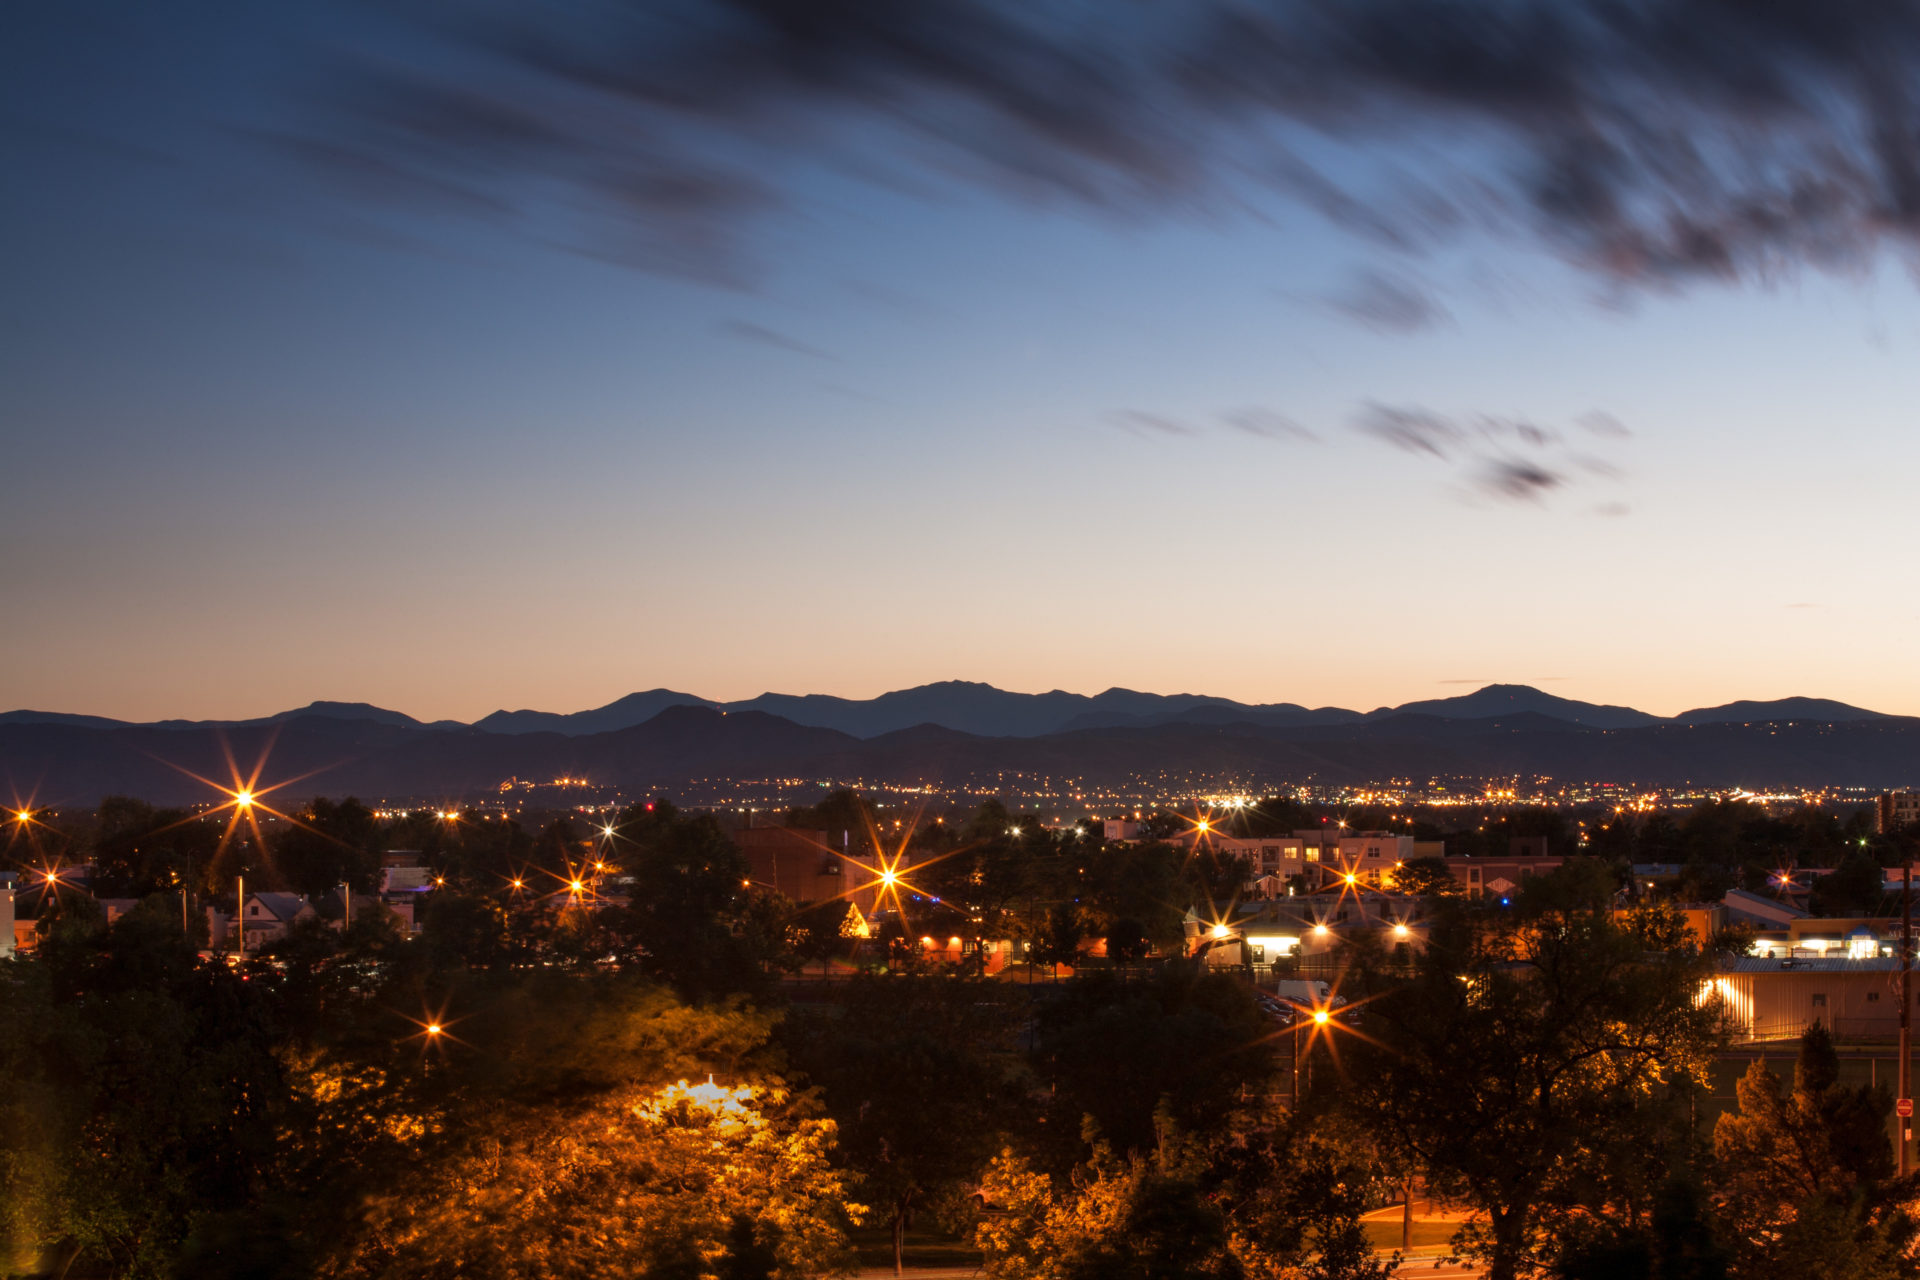 Mount Evans sunset - August 5, 2011